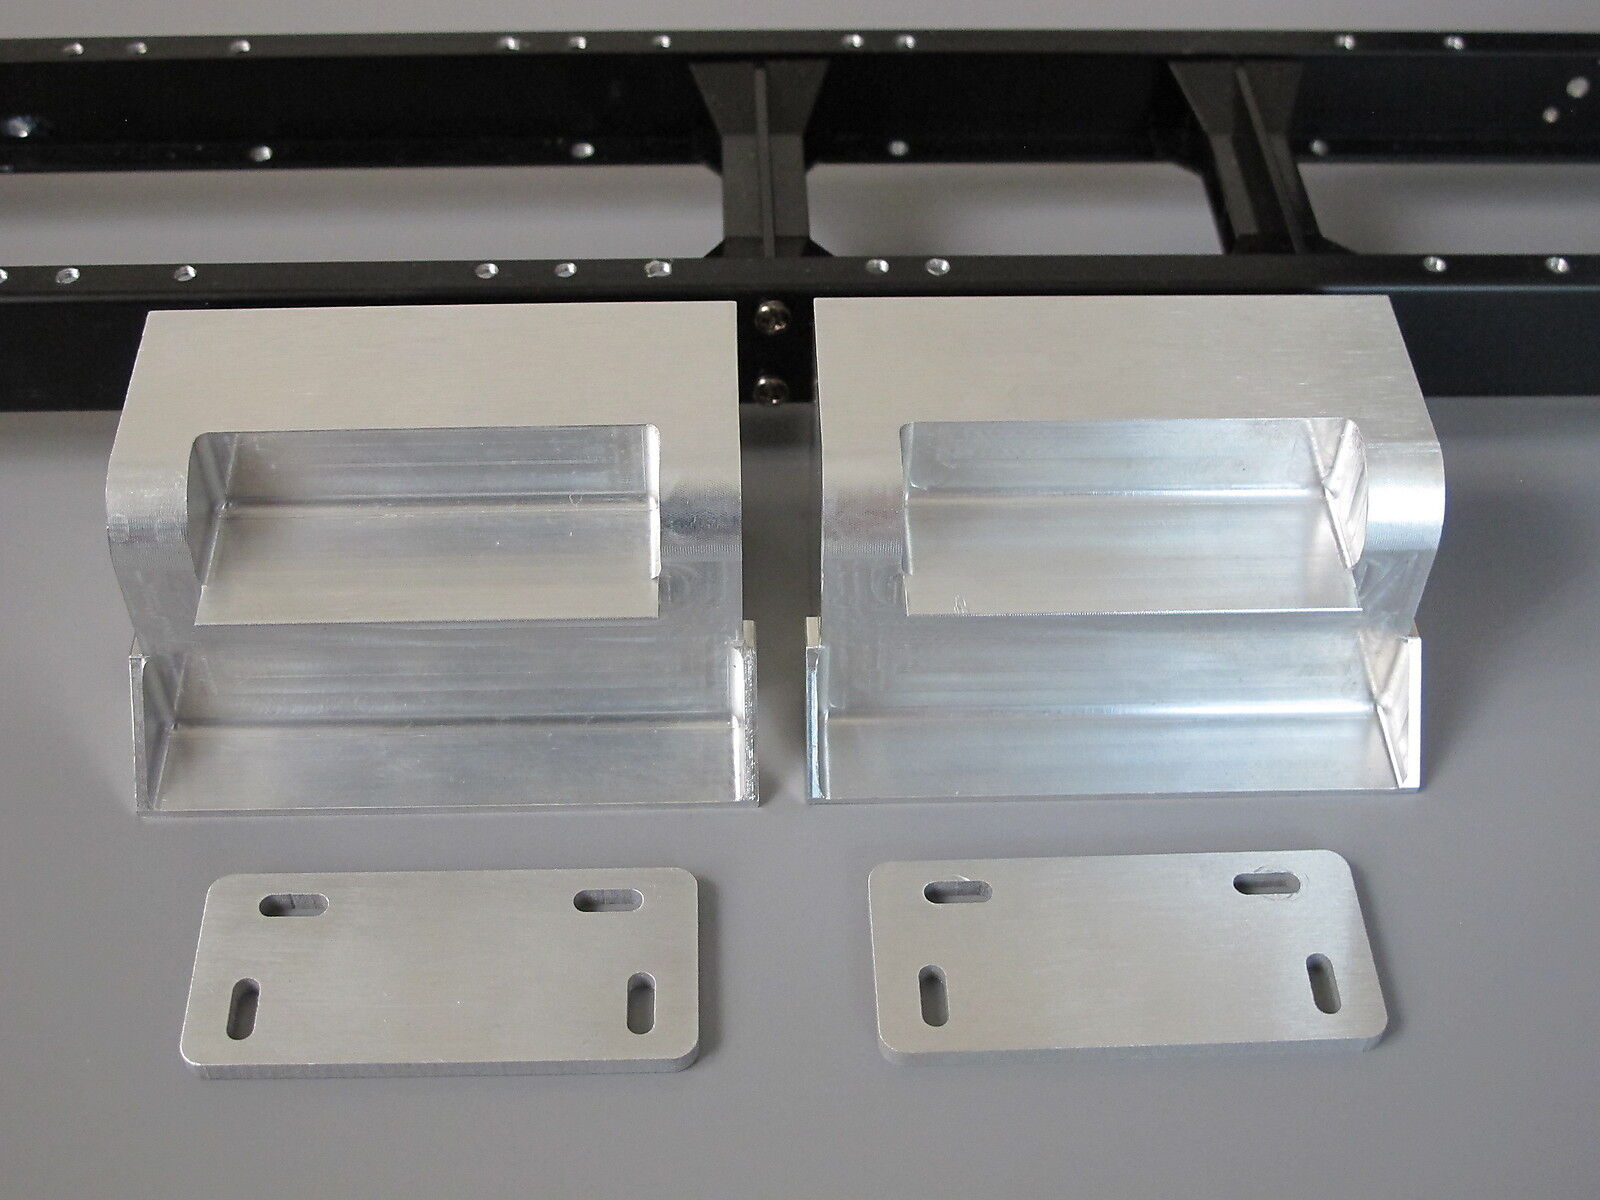 Pair Aluminum Side Step + Mount Tamiya R/C 1/14 King Grand Knight Hauler Aeromax